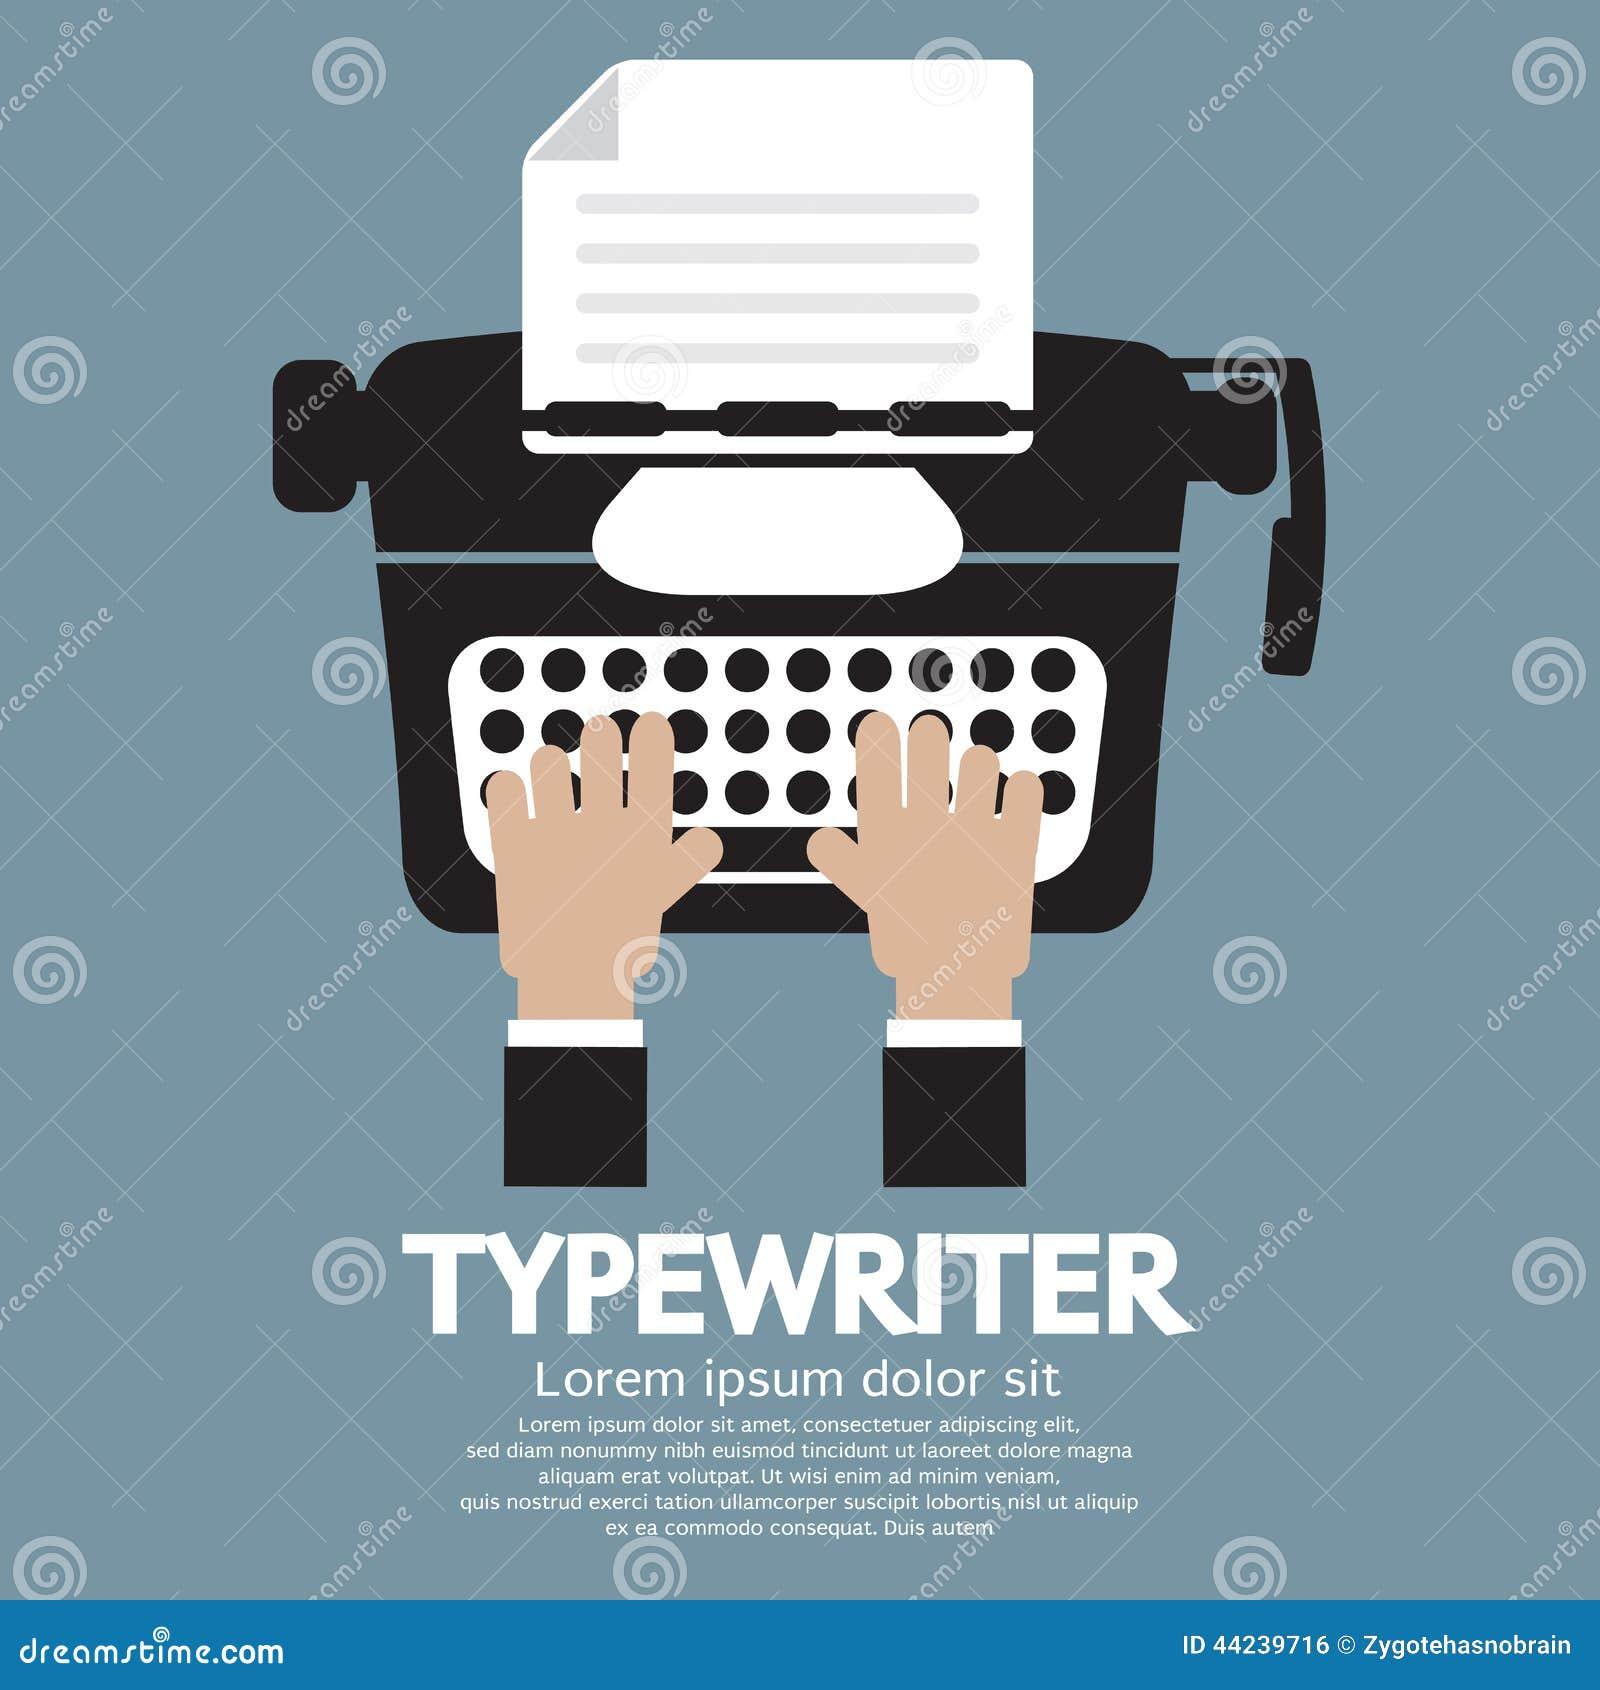 Flat Design of Typewriter The Classic Typing Machine